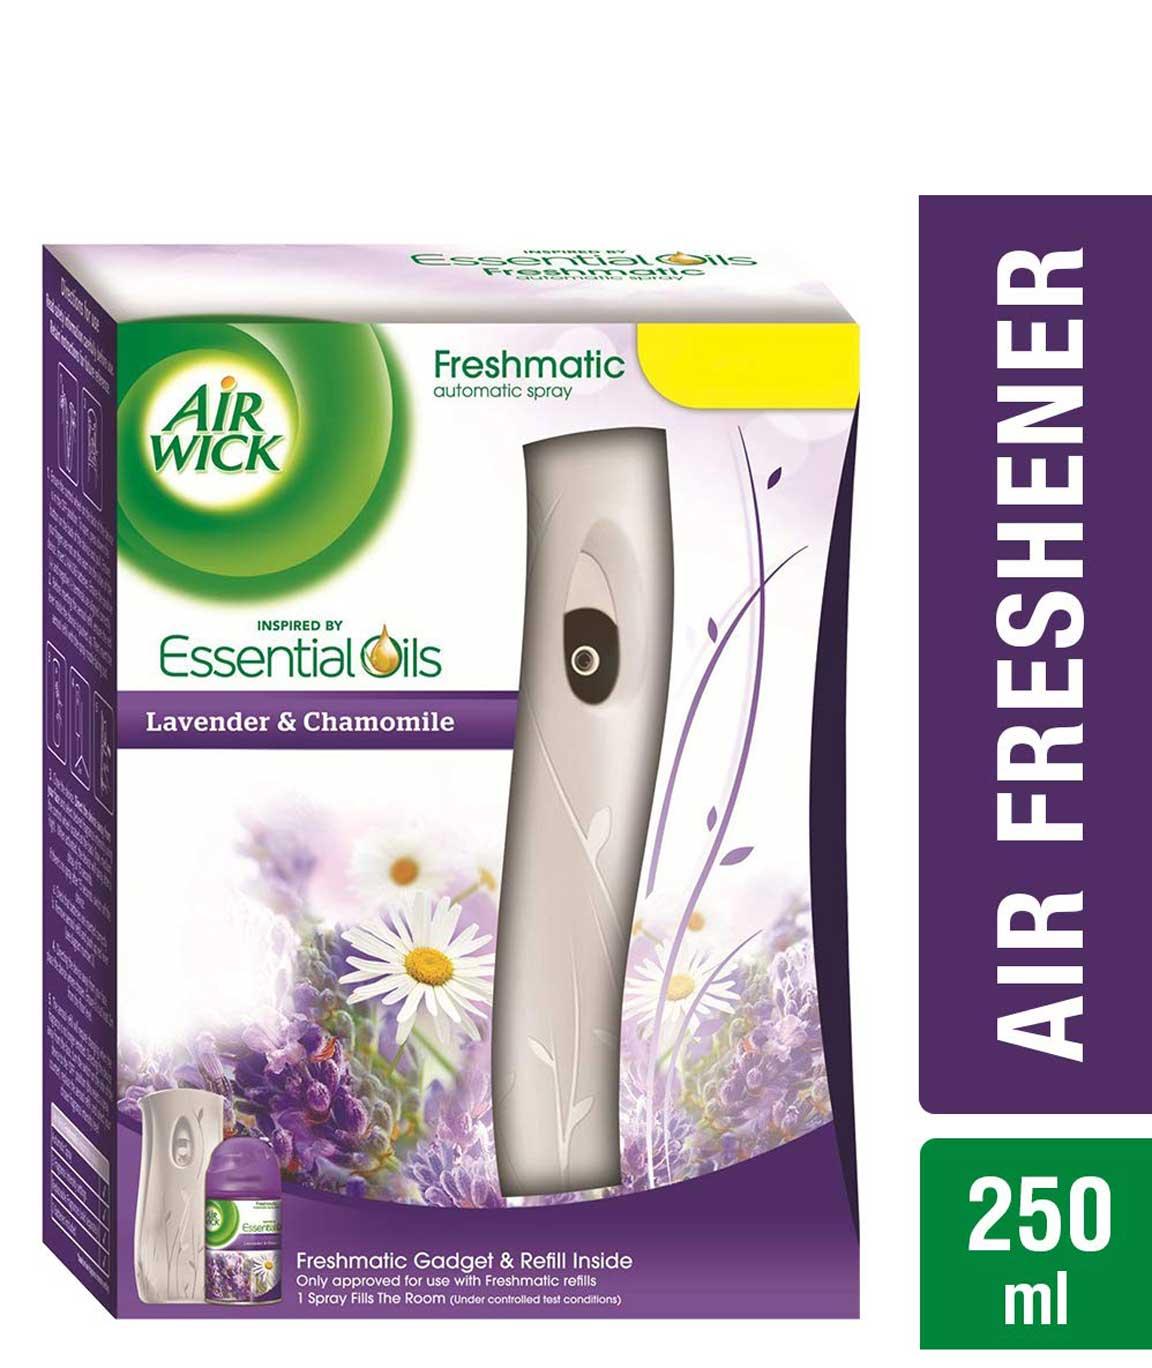 Airwick Freshmatic Complete Kit - Automatic Air Freshener - Lavender & Chamomile (250 ml)